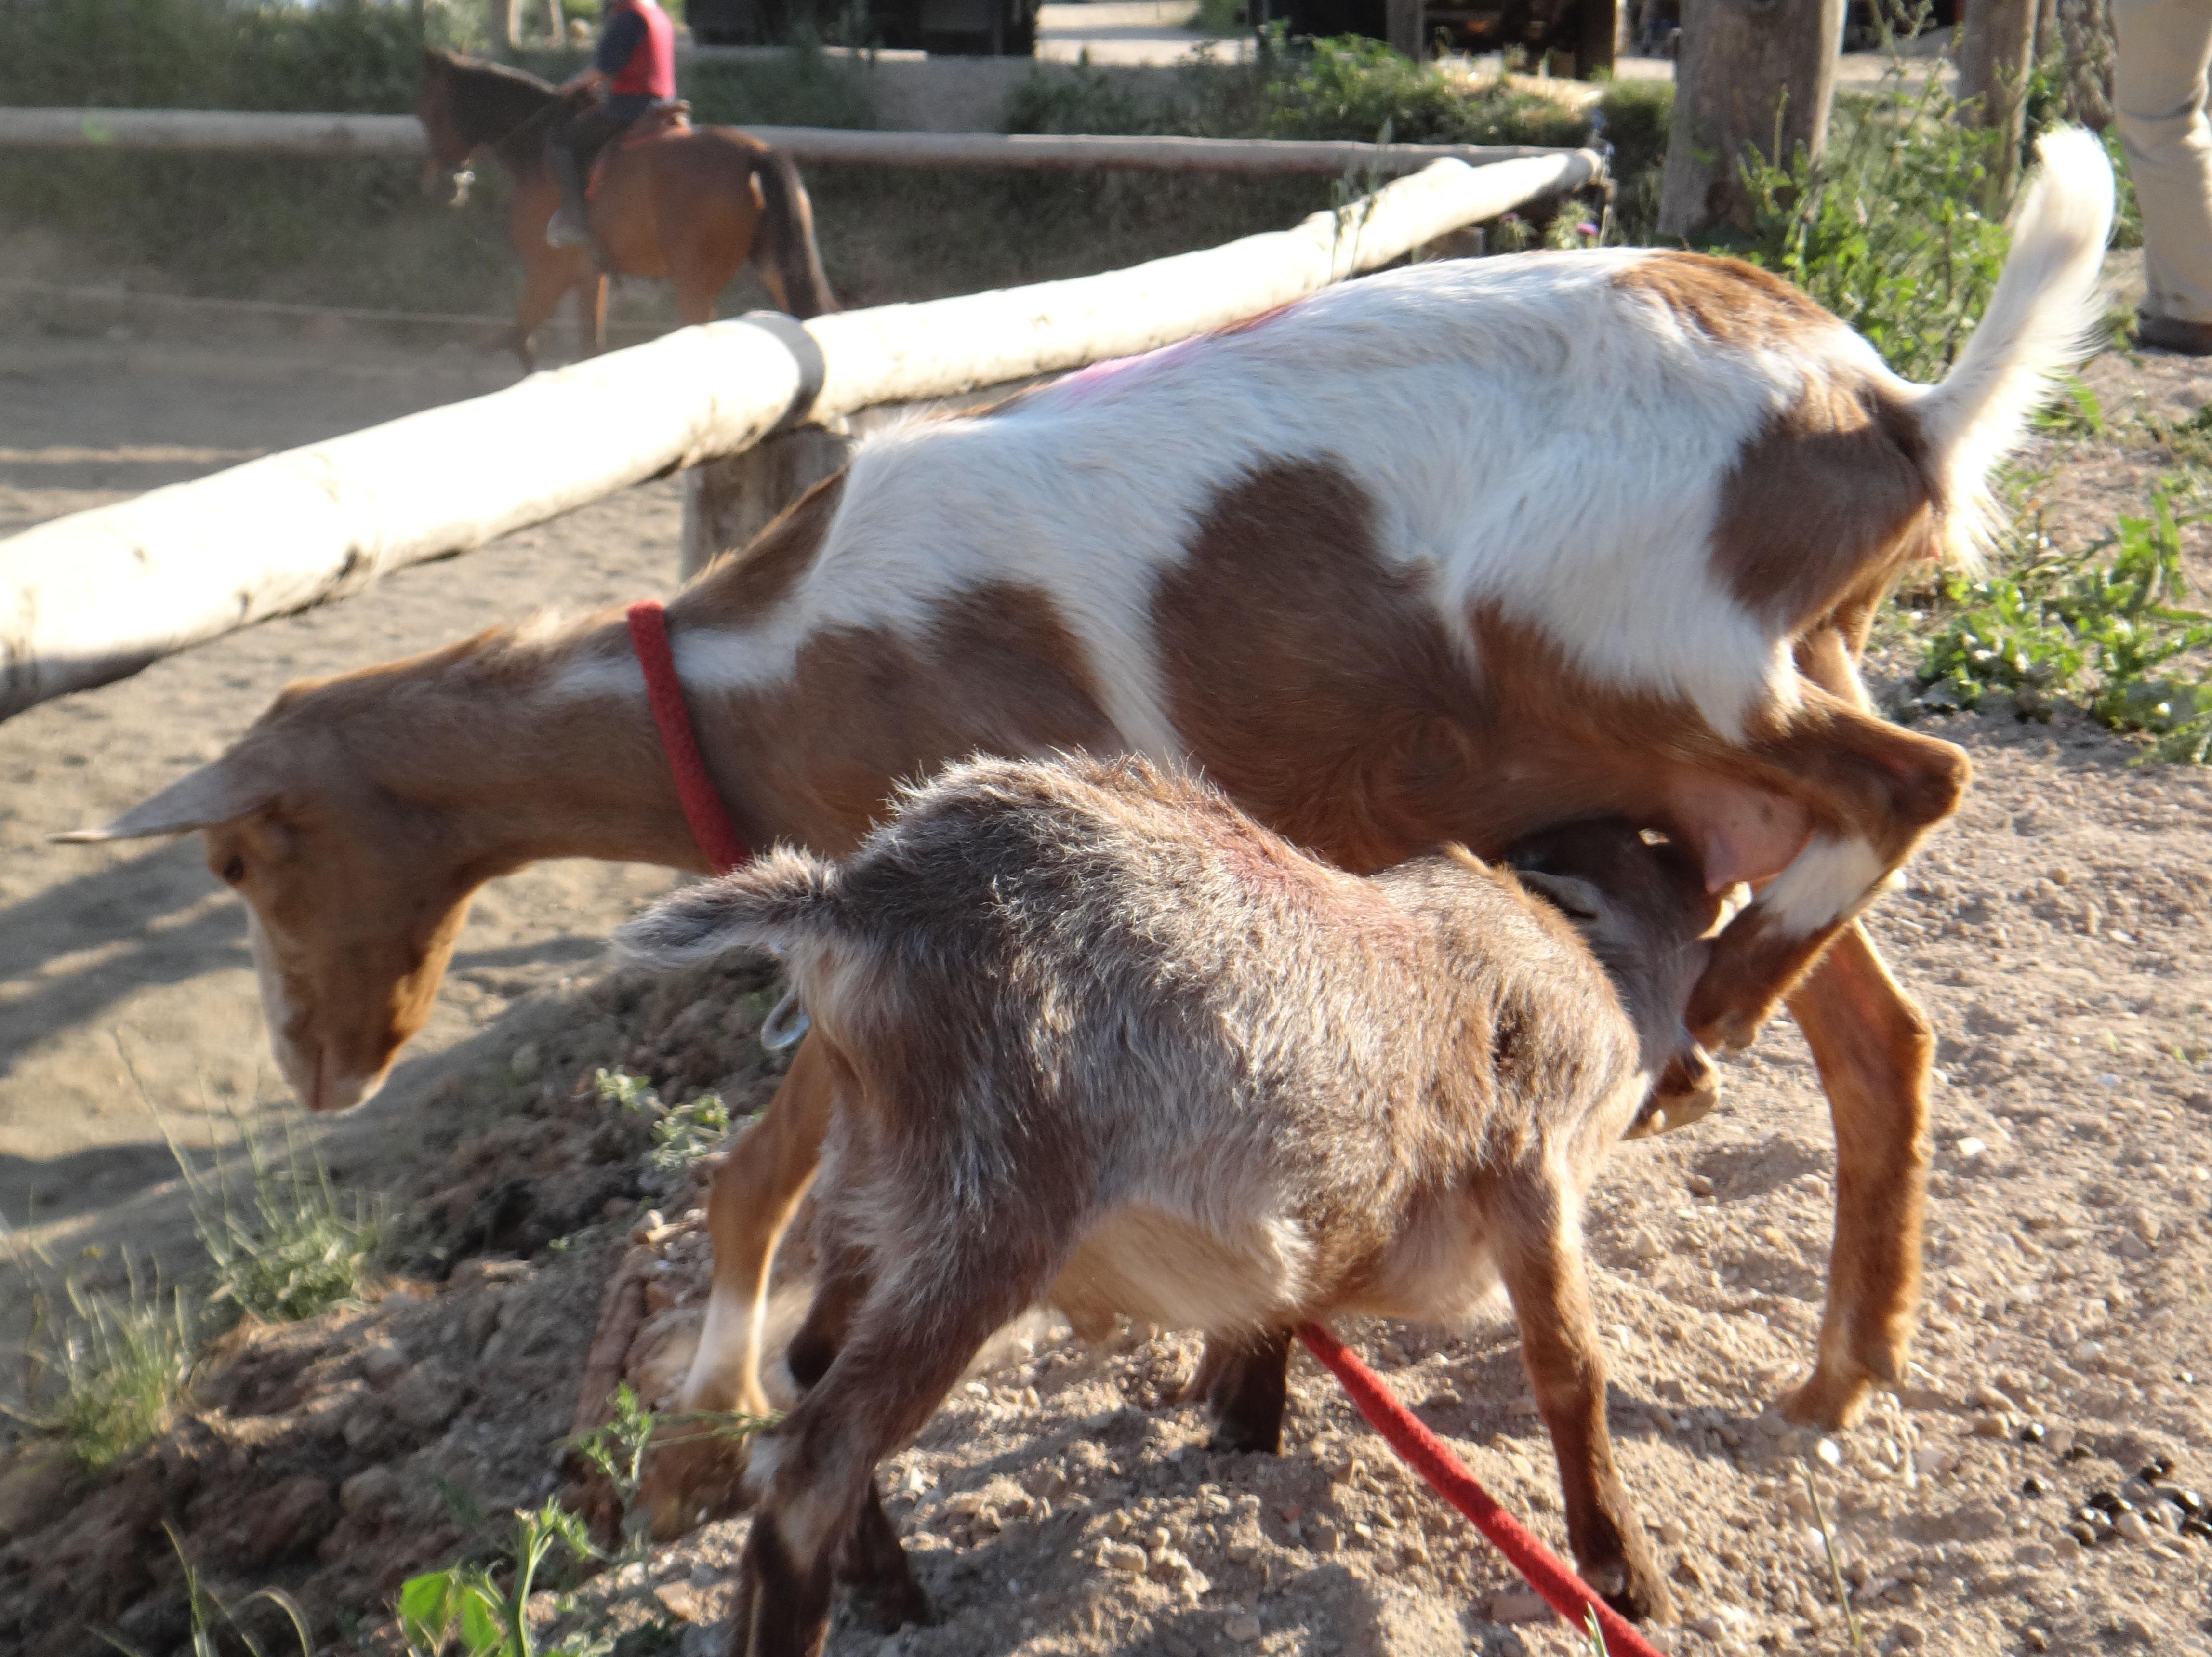 Foto 12 de Hípica y equitación en (Les Fonts) | Hípica Can Buimira